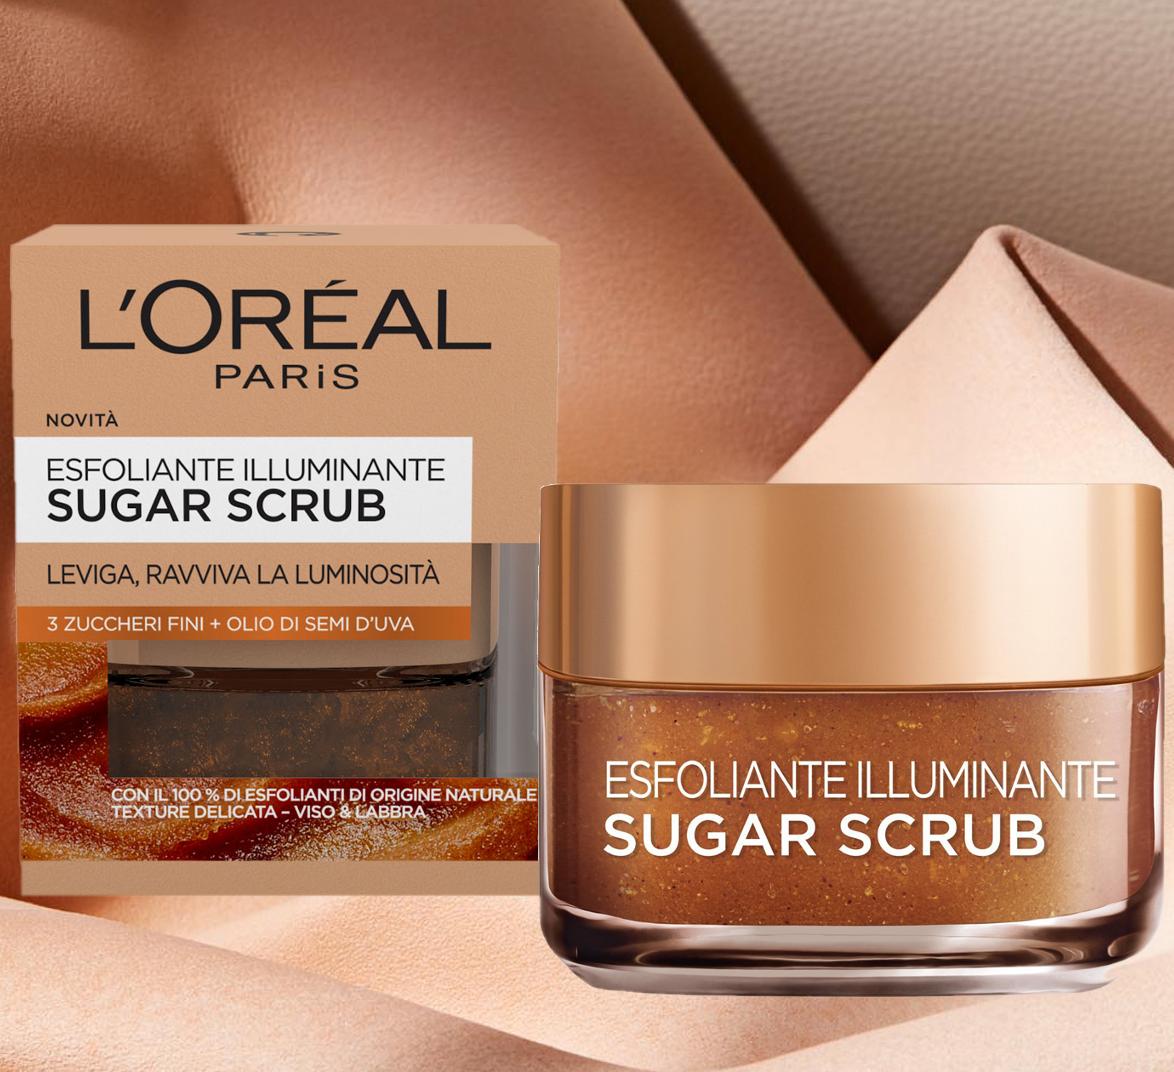 loreal-sugar-scrub-esfoliante-illuminante